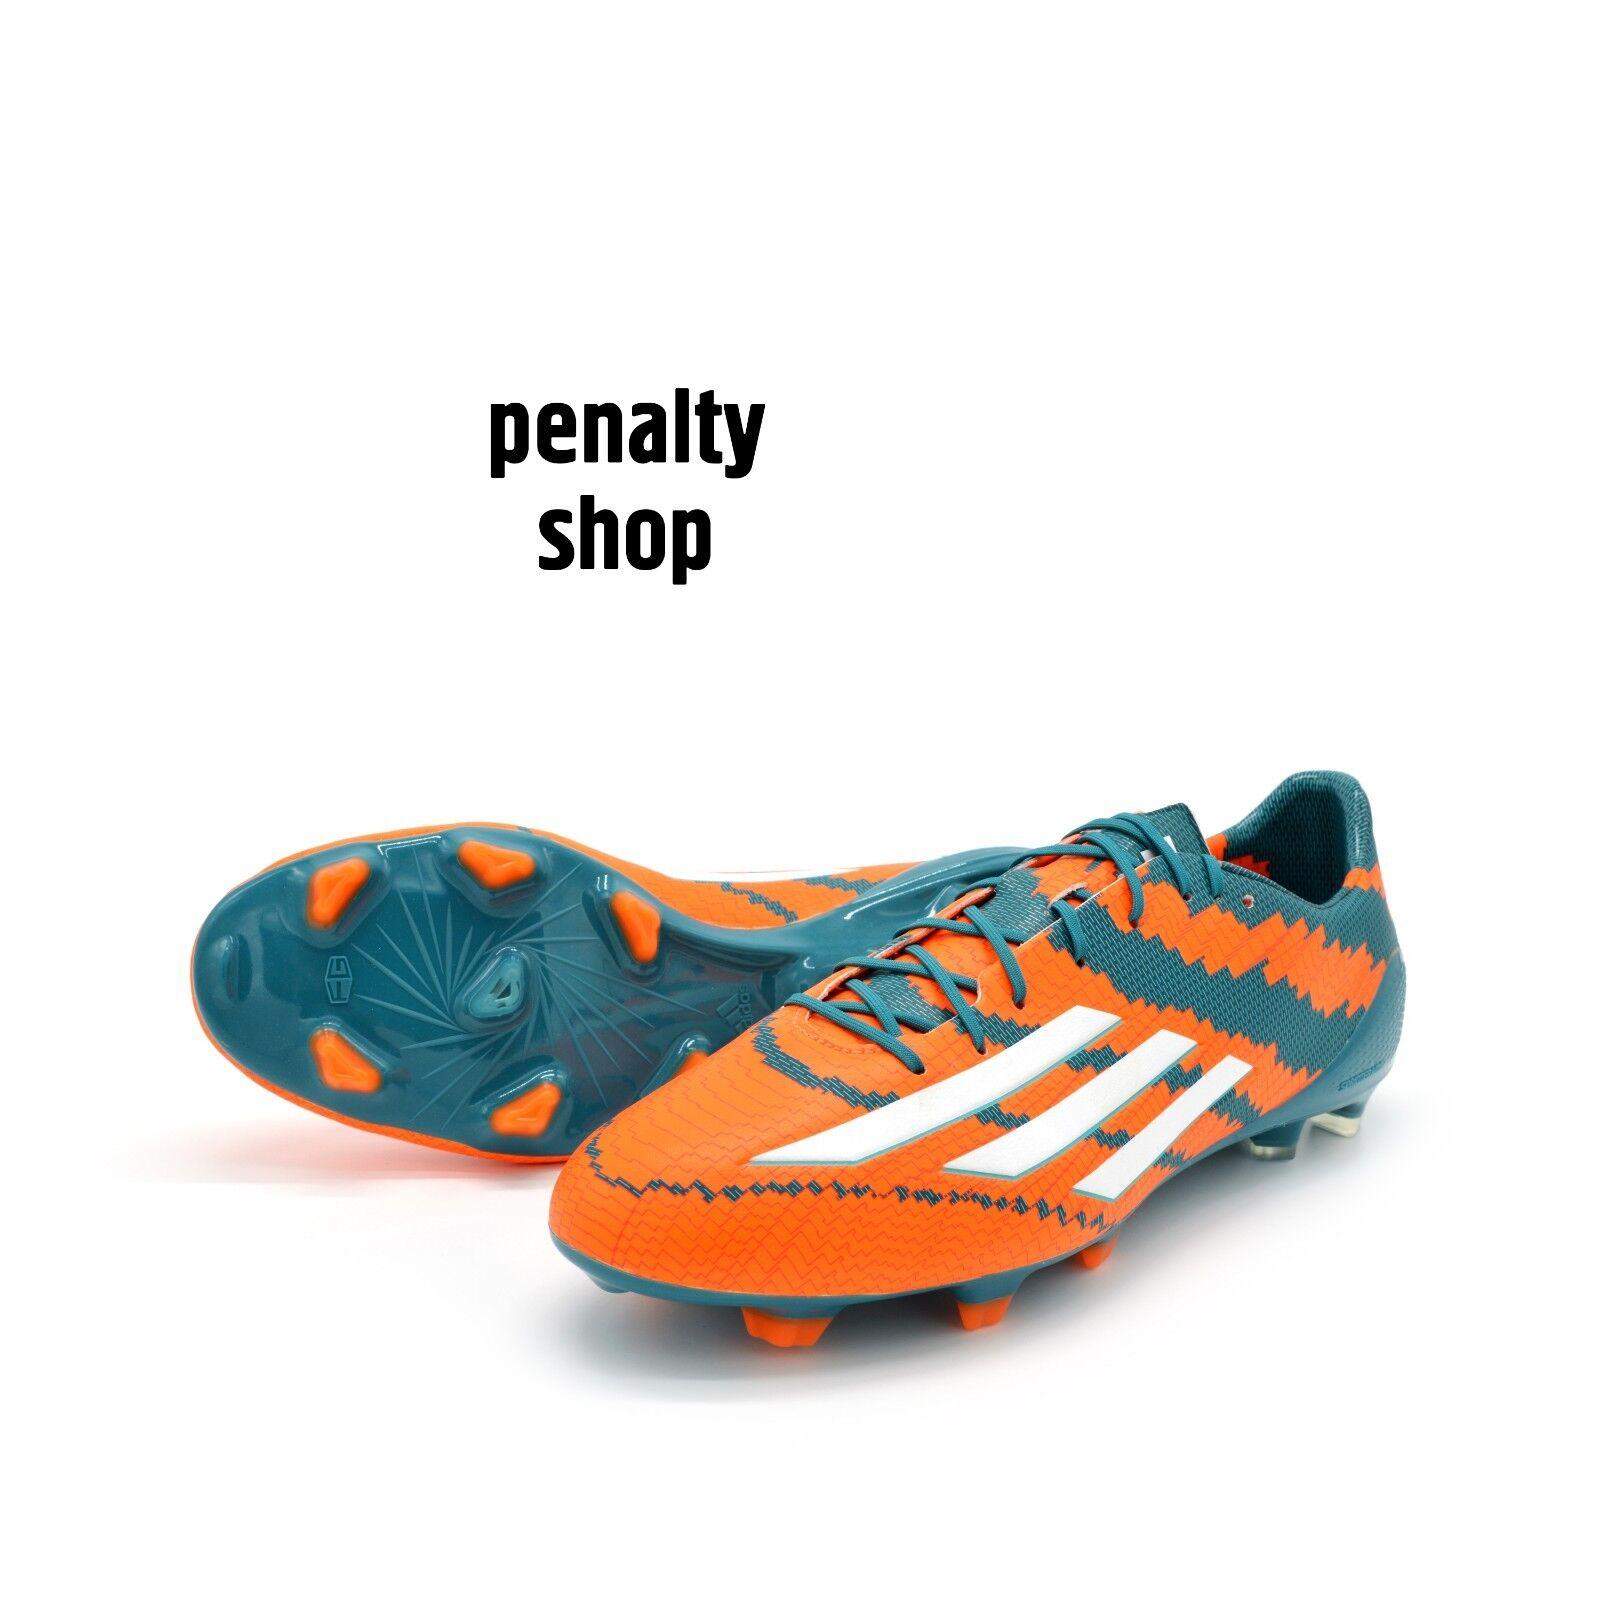 Adidas adizero F50 Messi 10.1 FG B44261 RARE Limited Edition